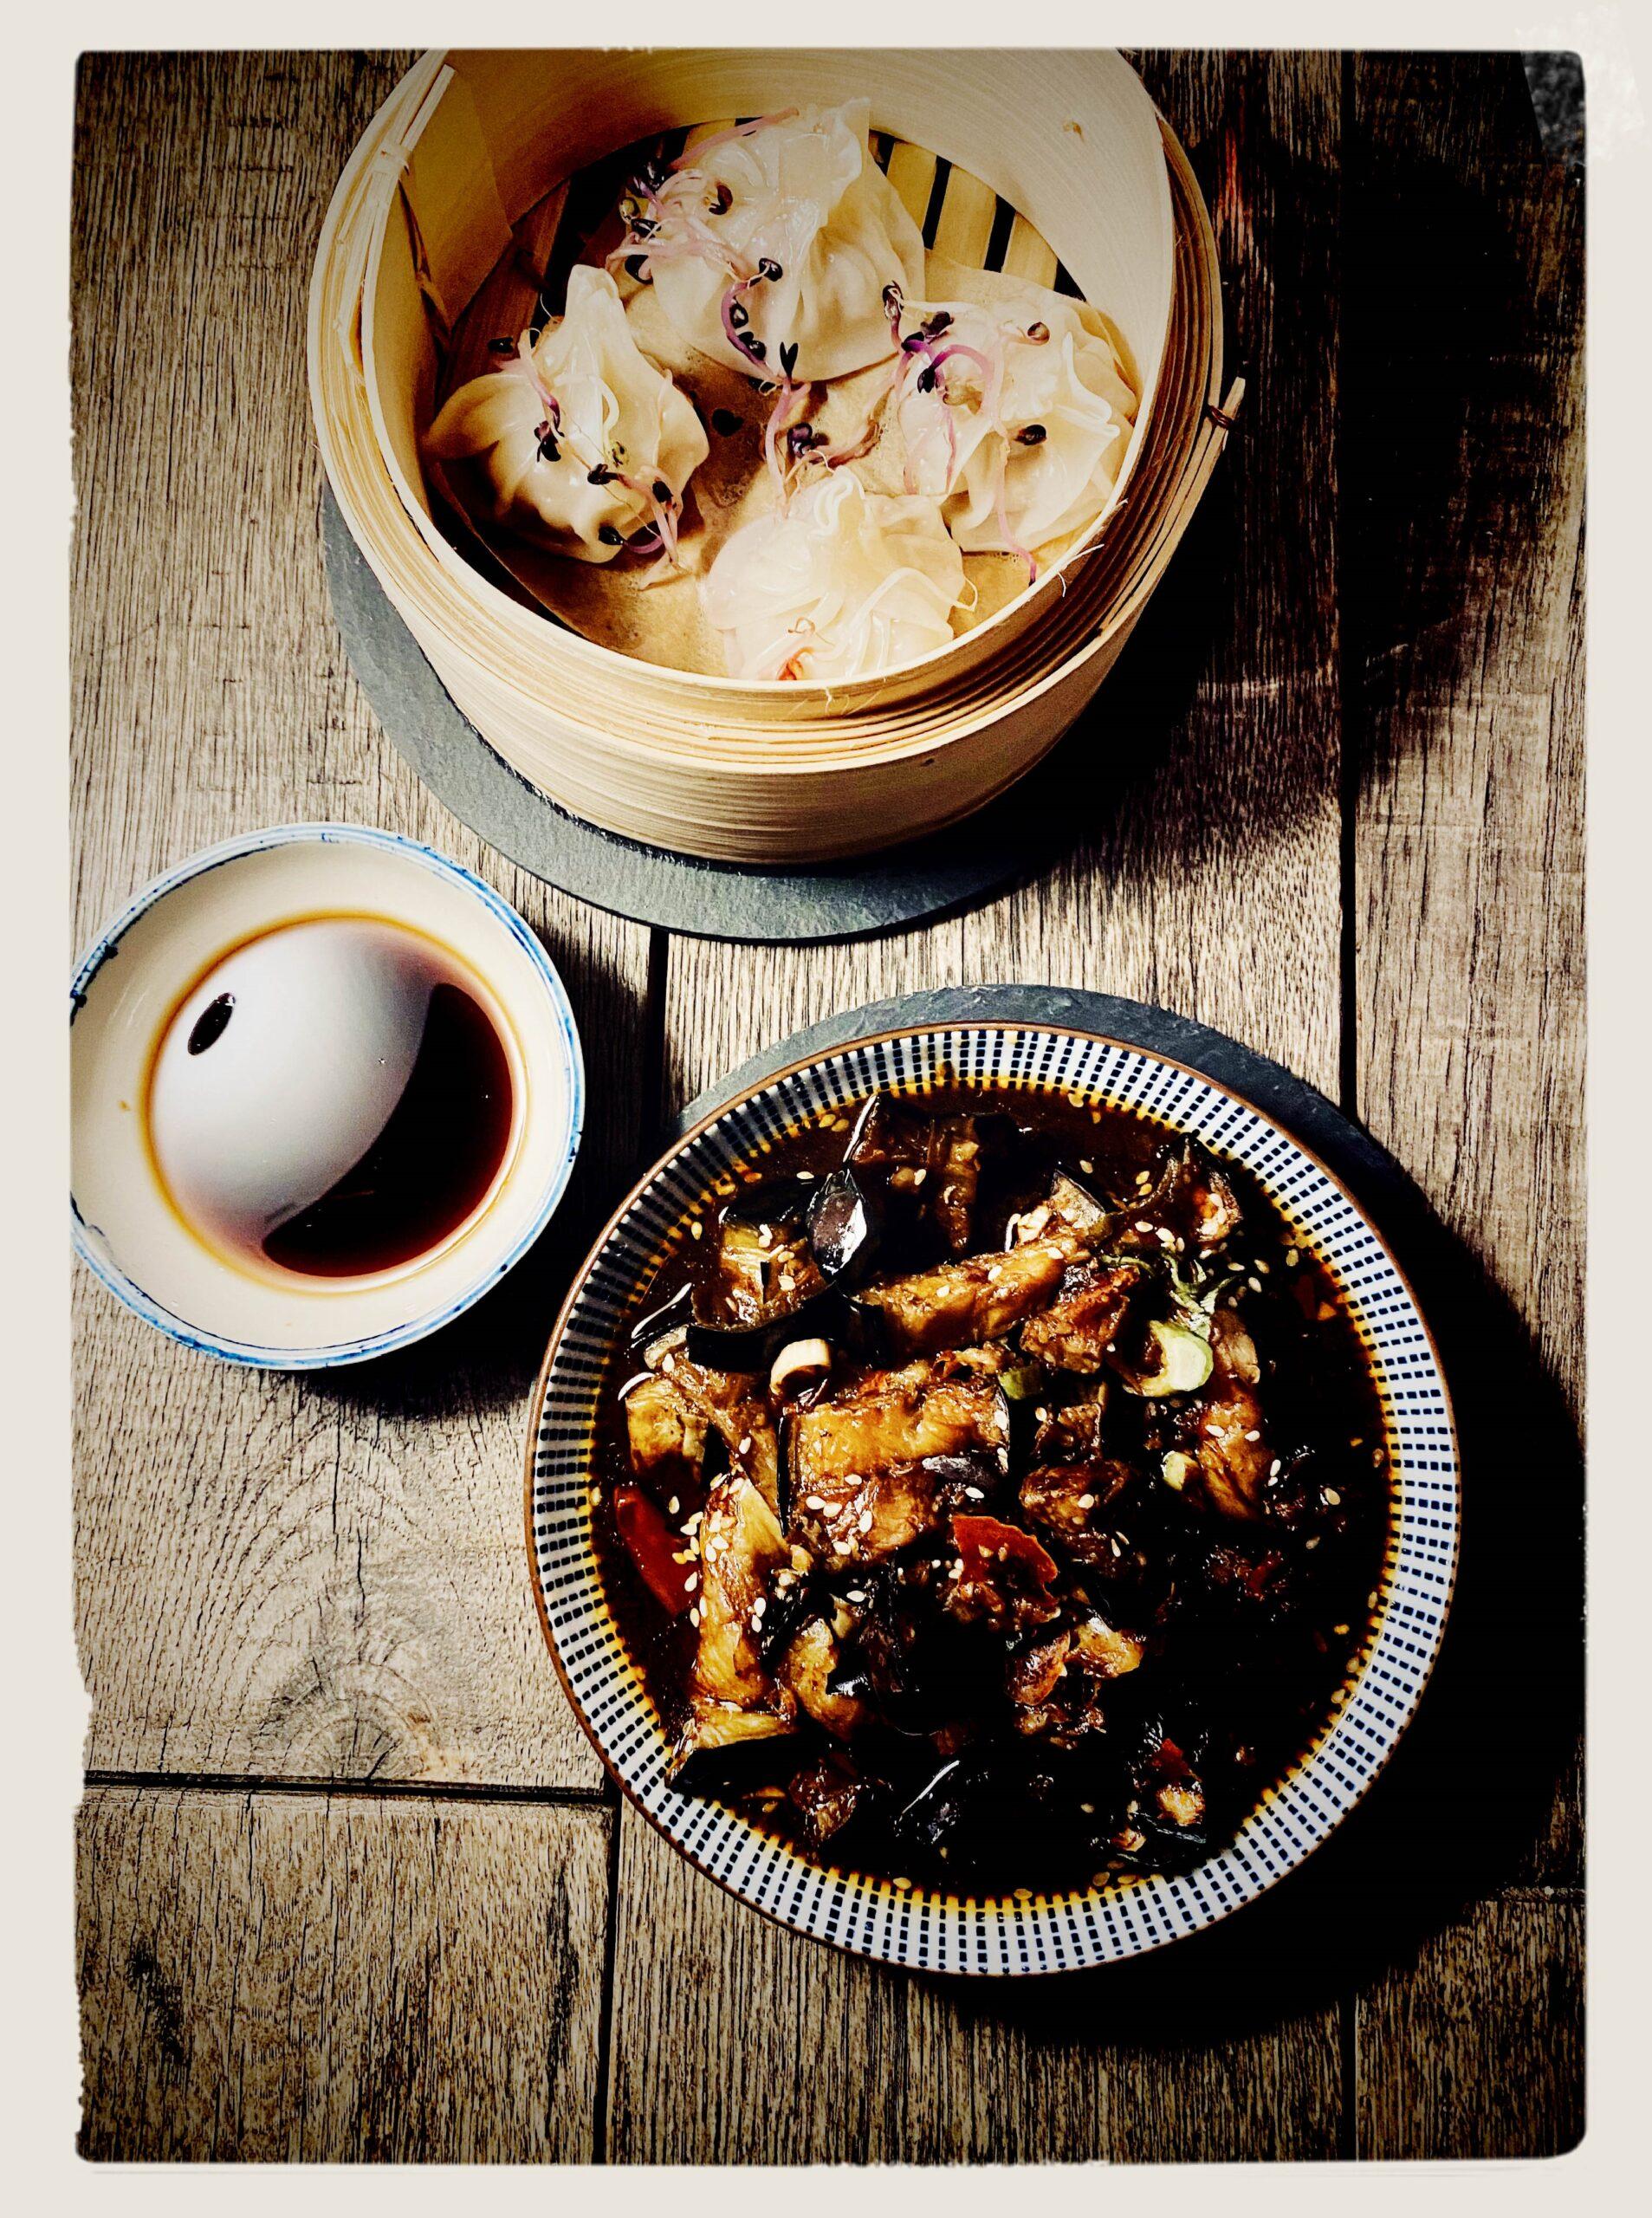 HAVEN DELUXE DINING - POP UP RESTUARANT